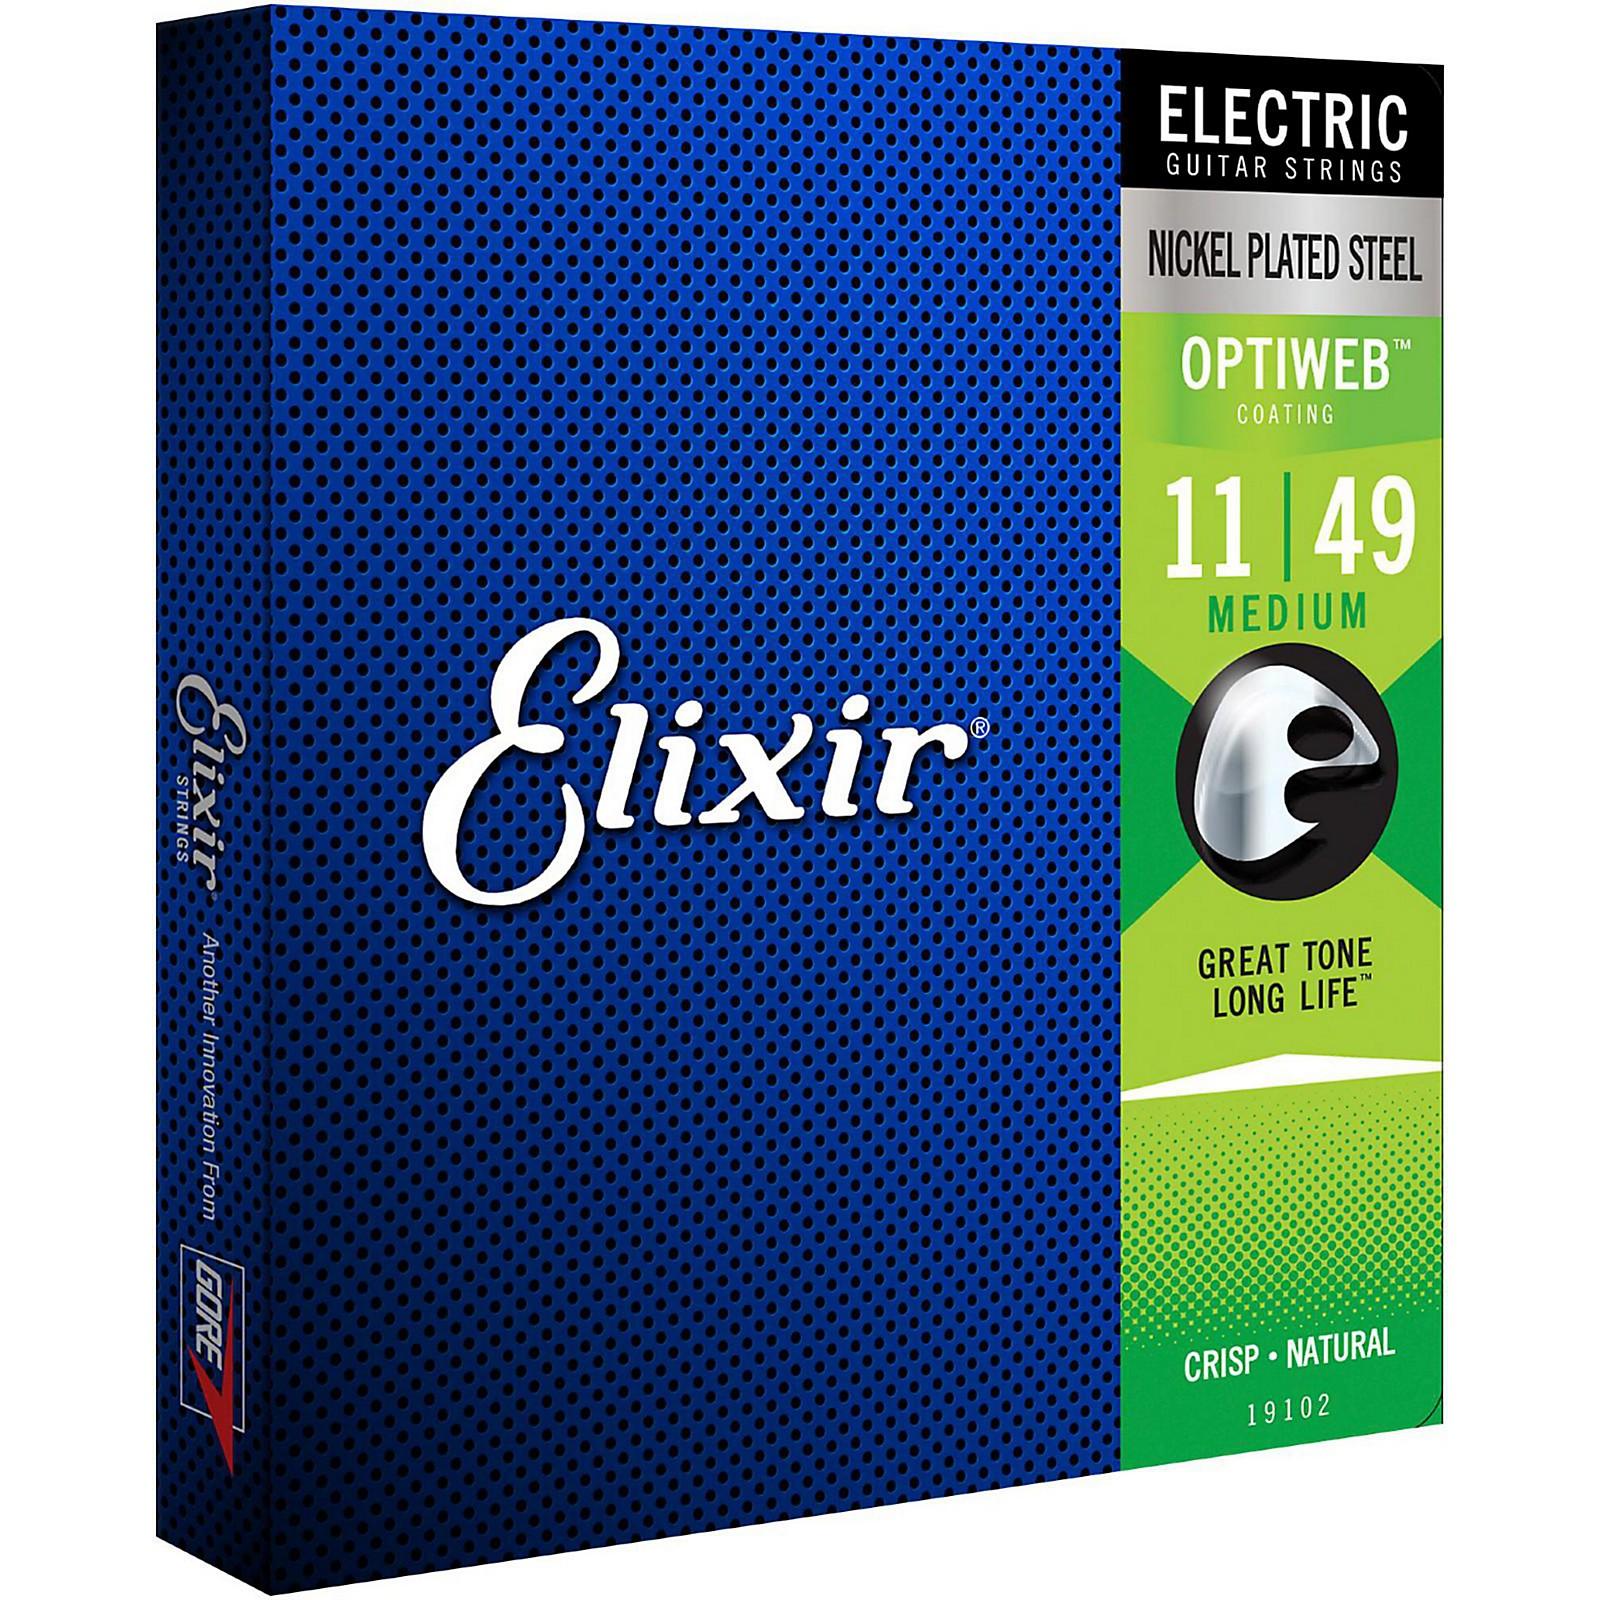 Elixir Electric Guitar Strings with OPTIWEB Coating, Medium (.011-.049)